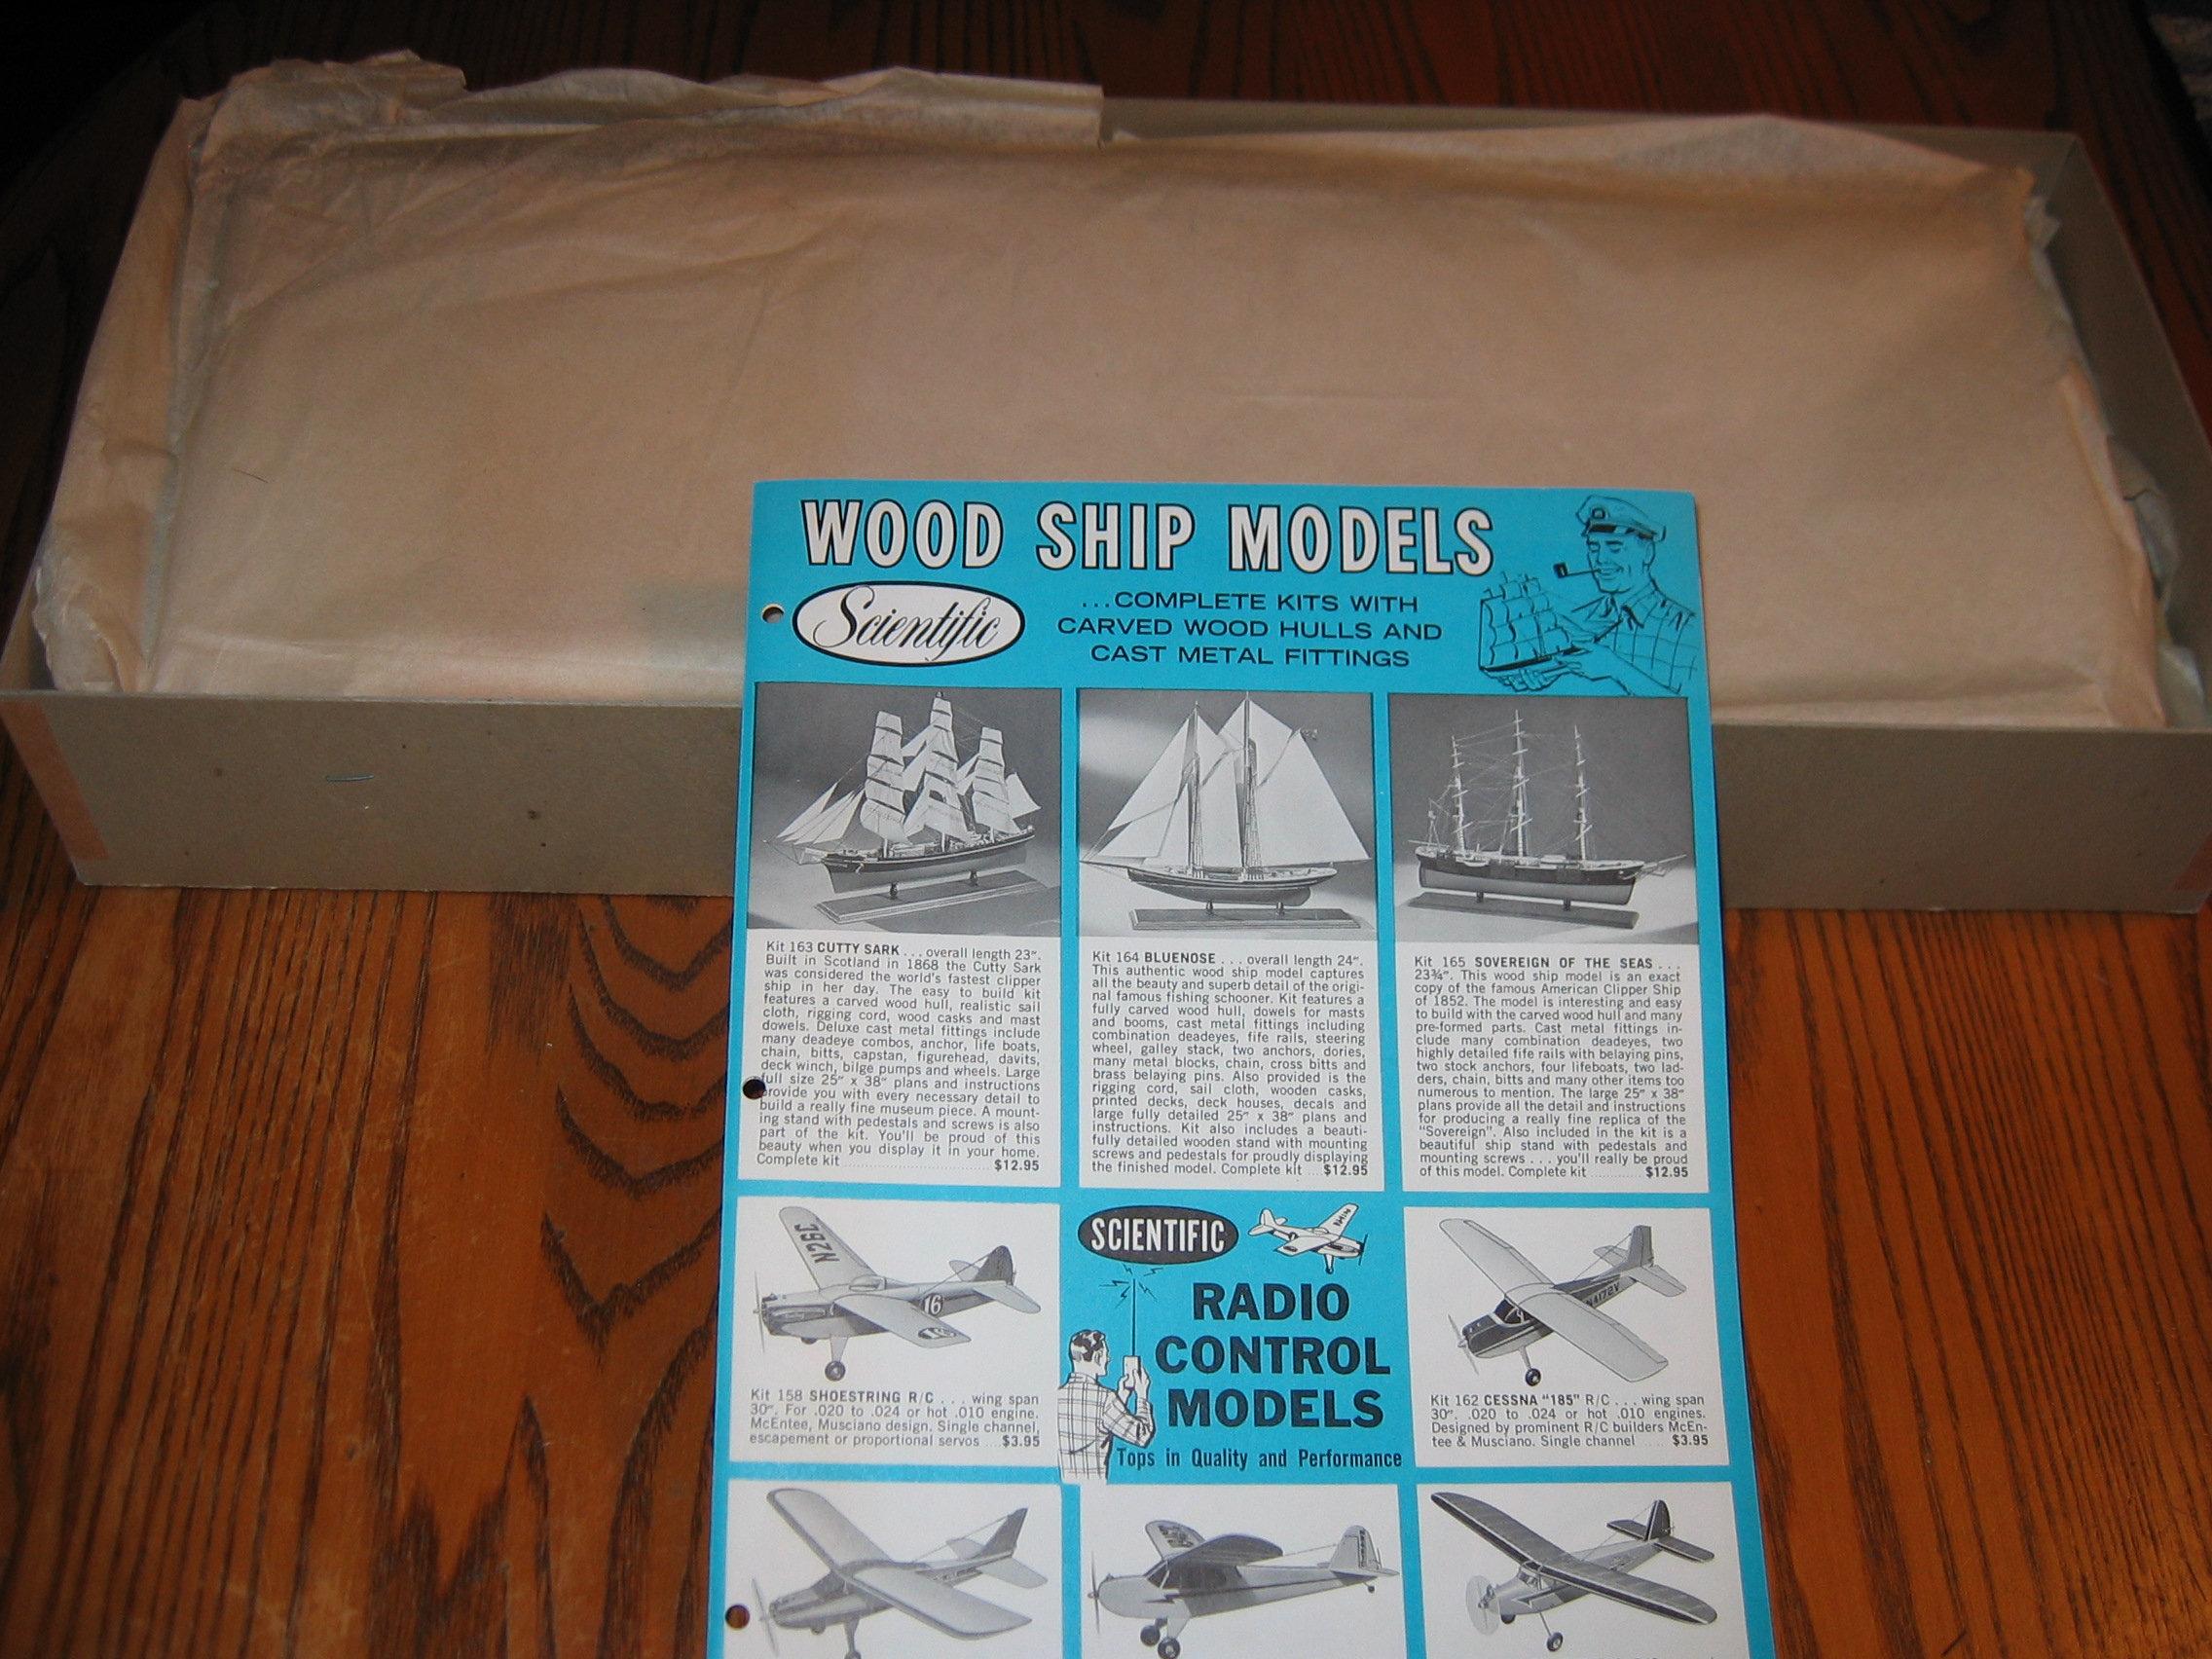 vintage wooden ship model kit schooner bluenose scientific model co.,  newark, nj, usa 1970s | schooner chandlery